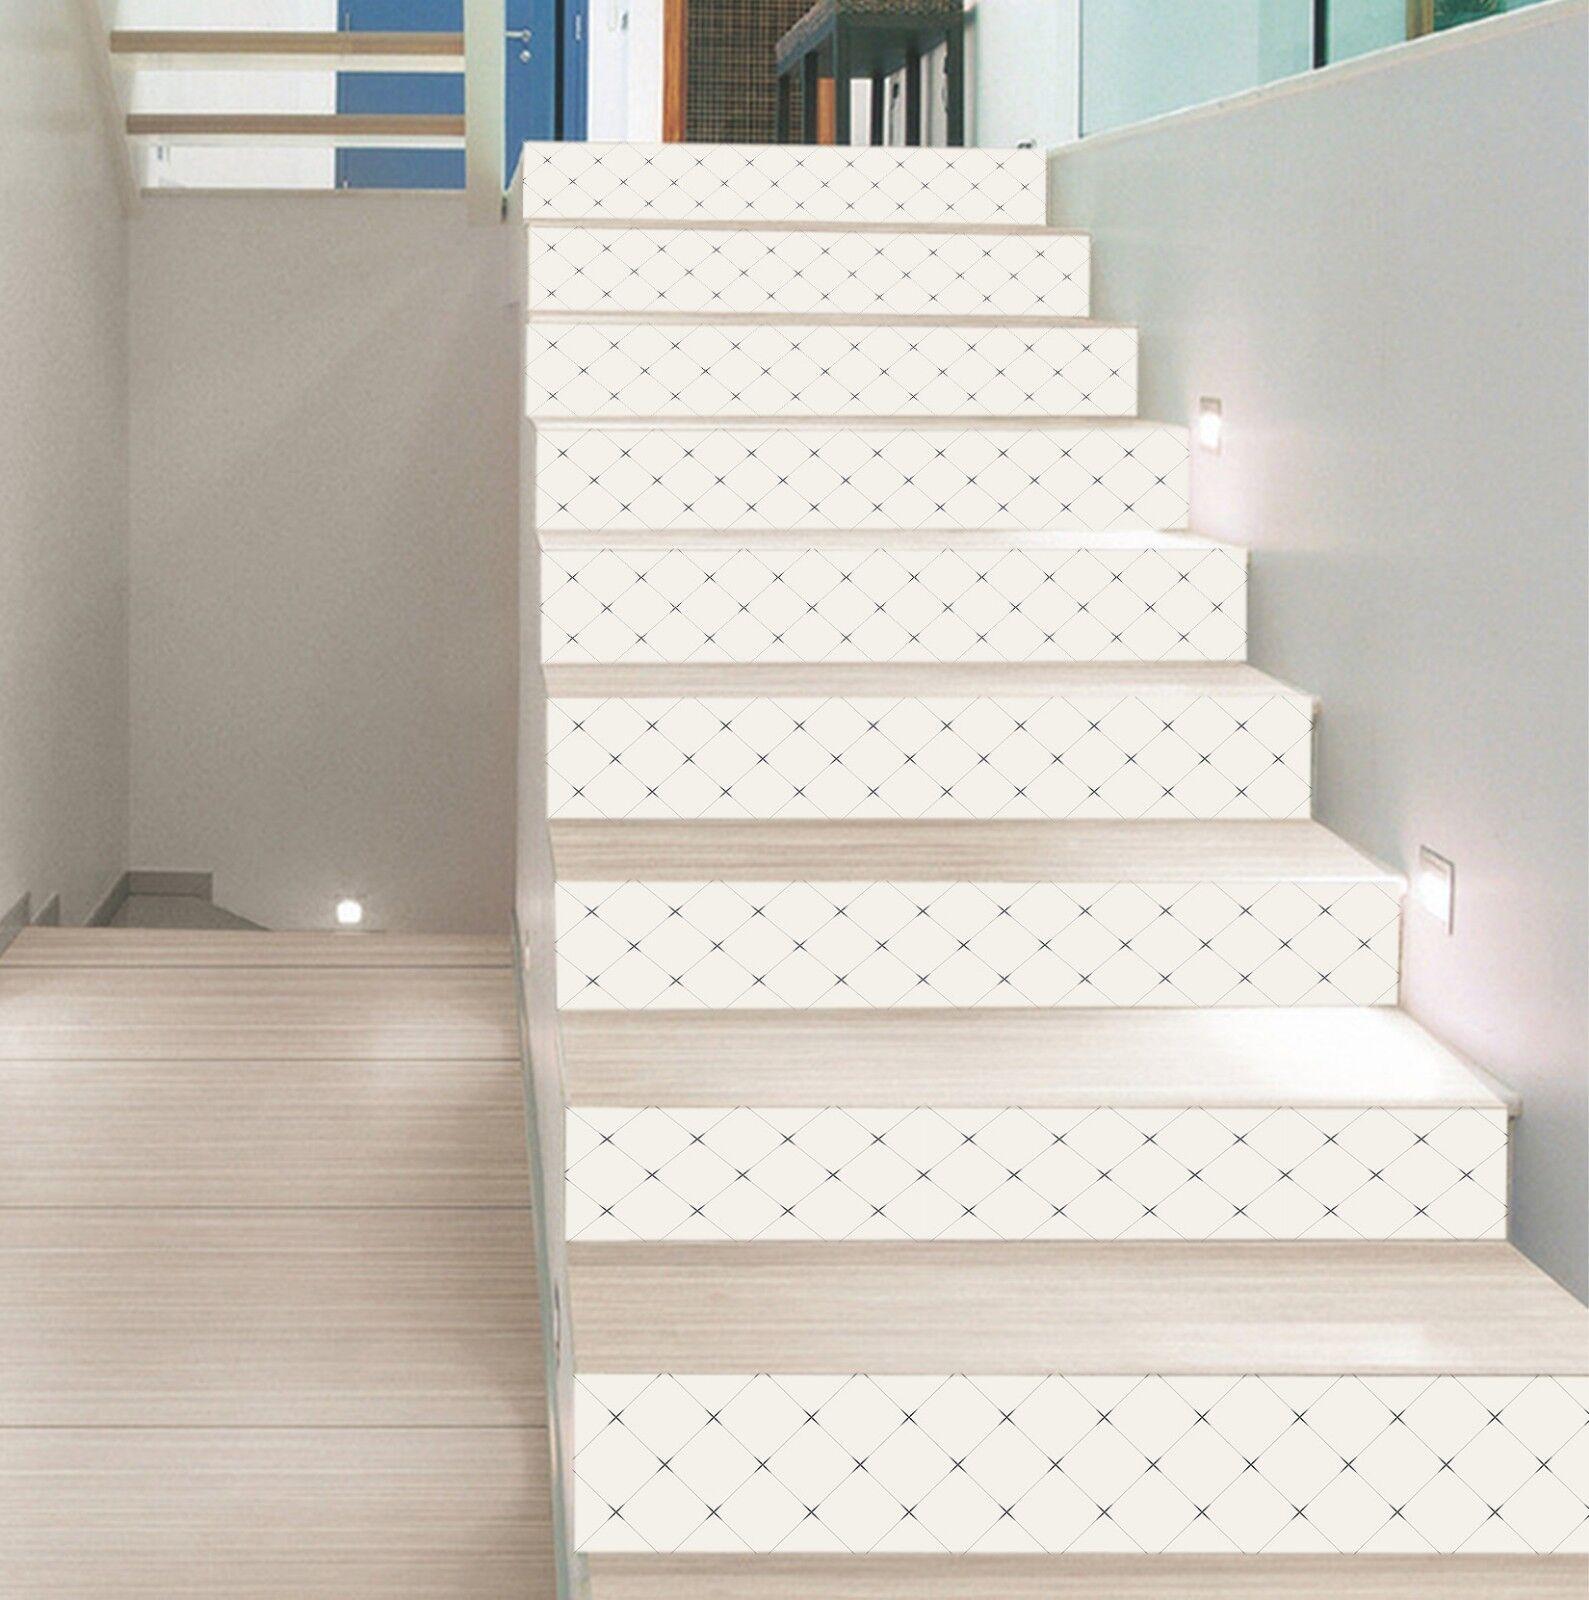 3D Stern Ziegel 87 Fliese Marmor Stair Risers Fototapete Vinyl Aufkleber Tapete